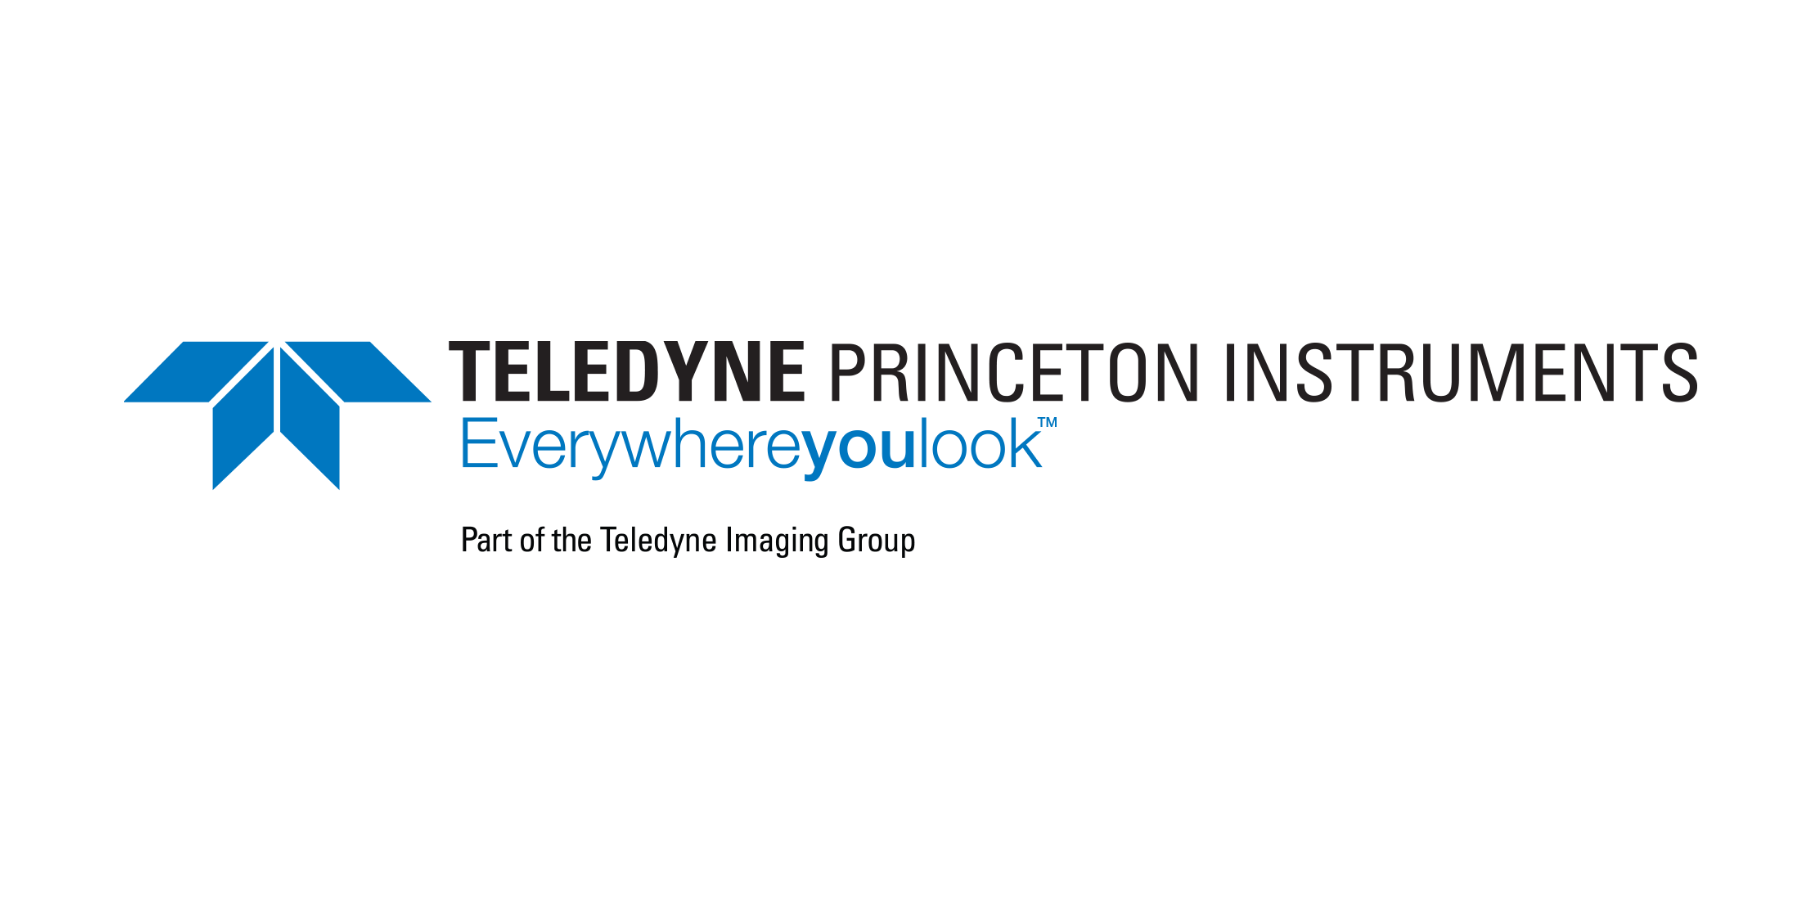 Teledyne Princeton Instruments